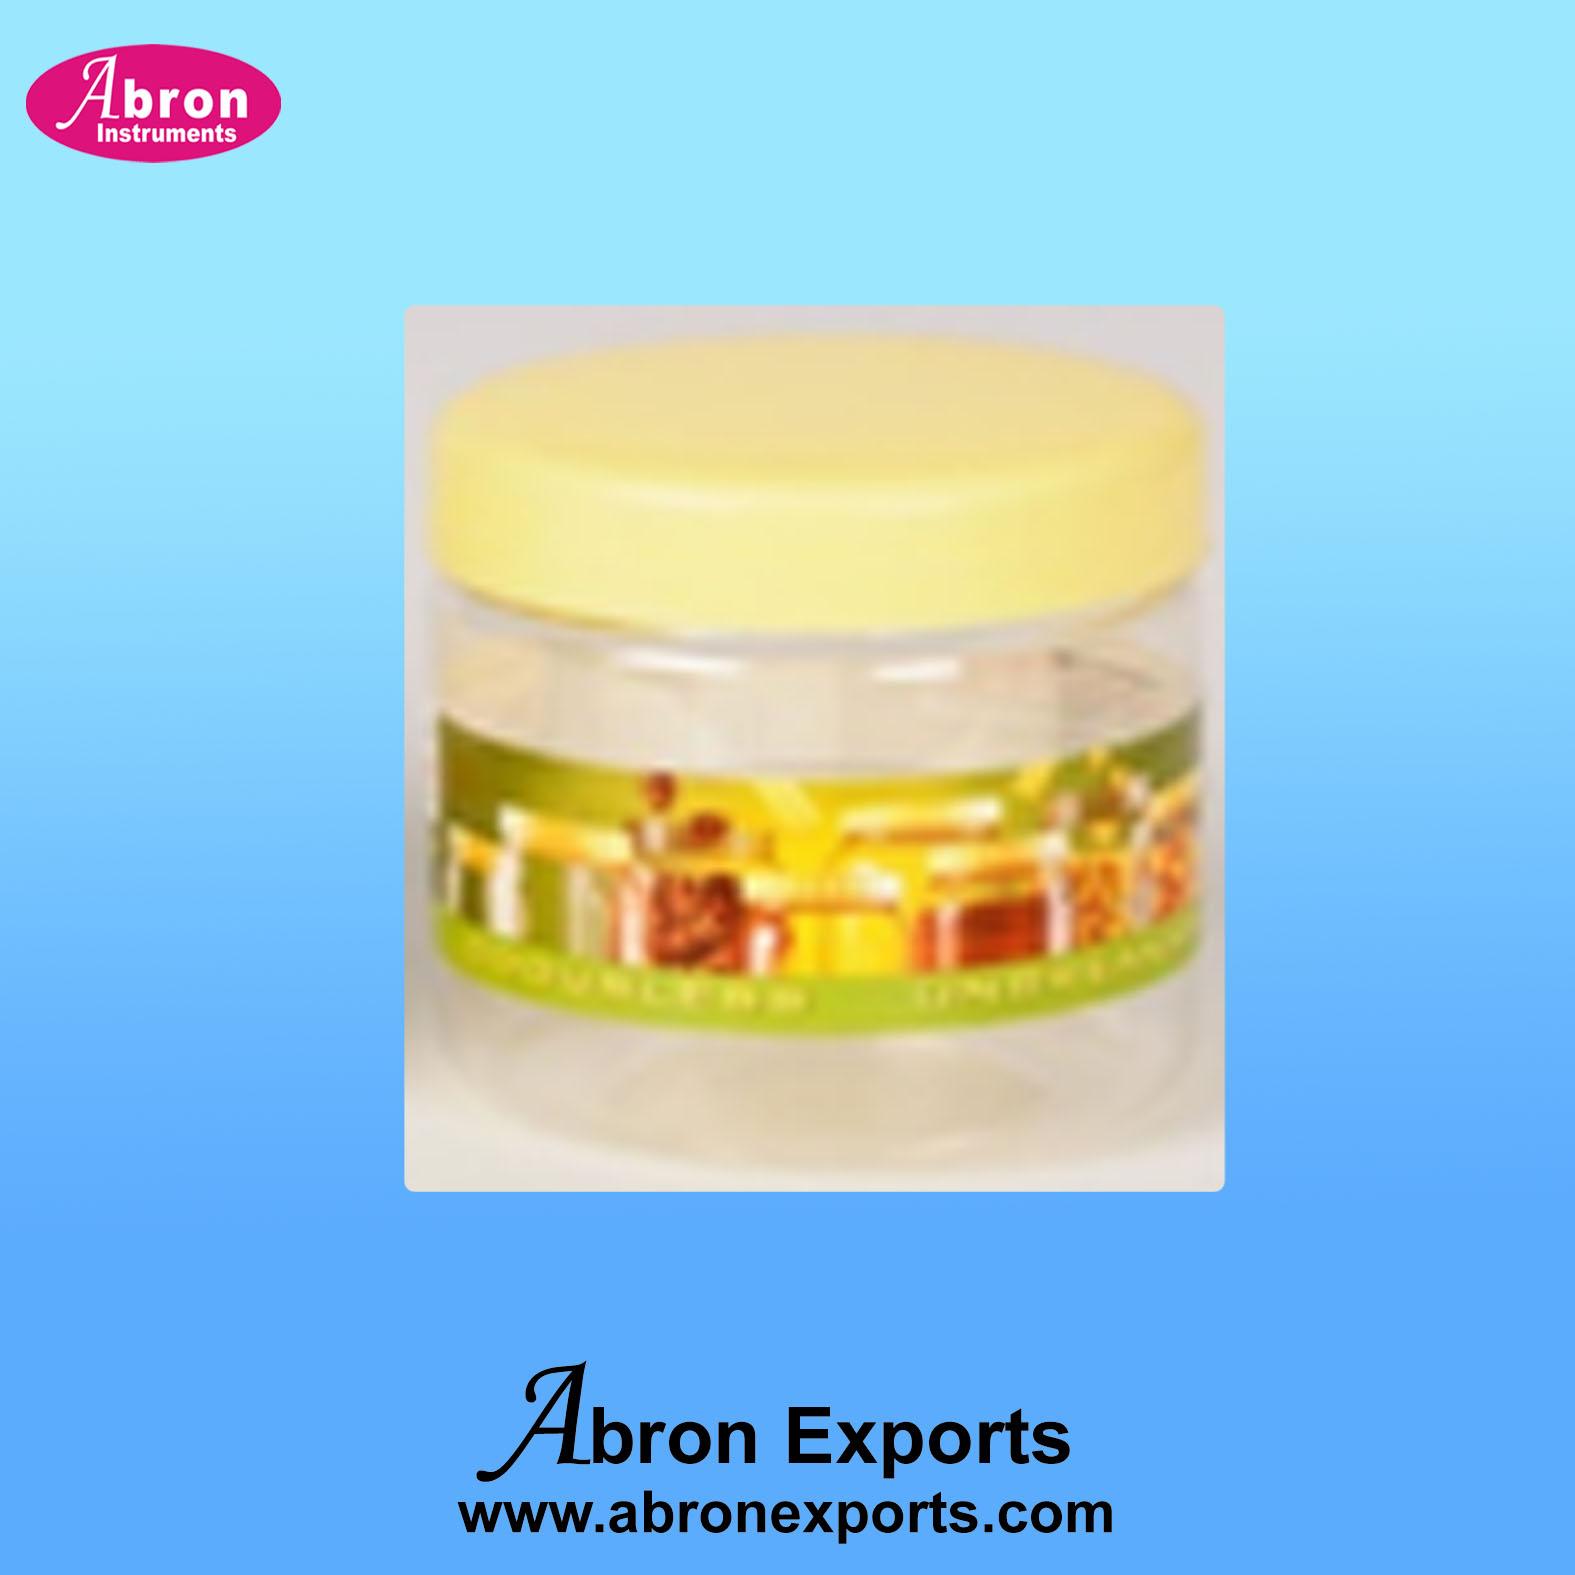 Honey Packing Cap Seal 50gm Abron AT-9516-50